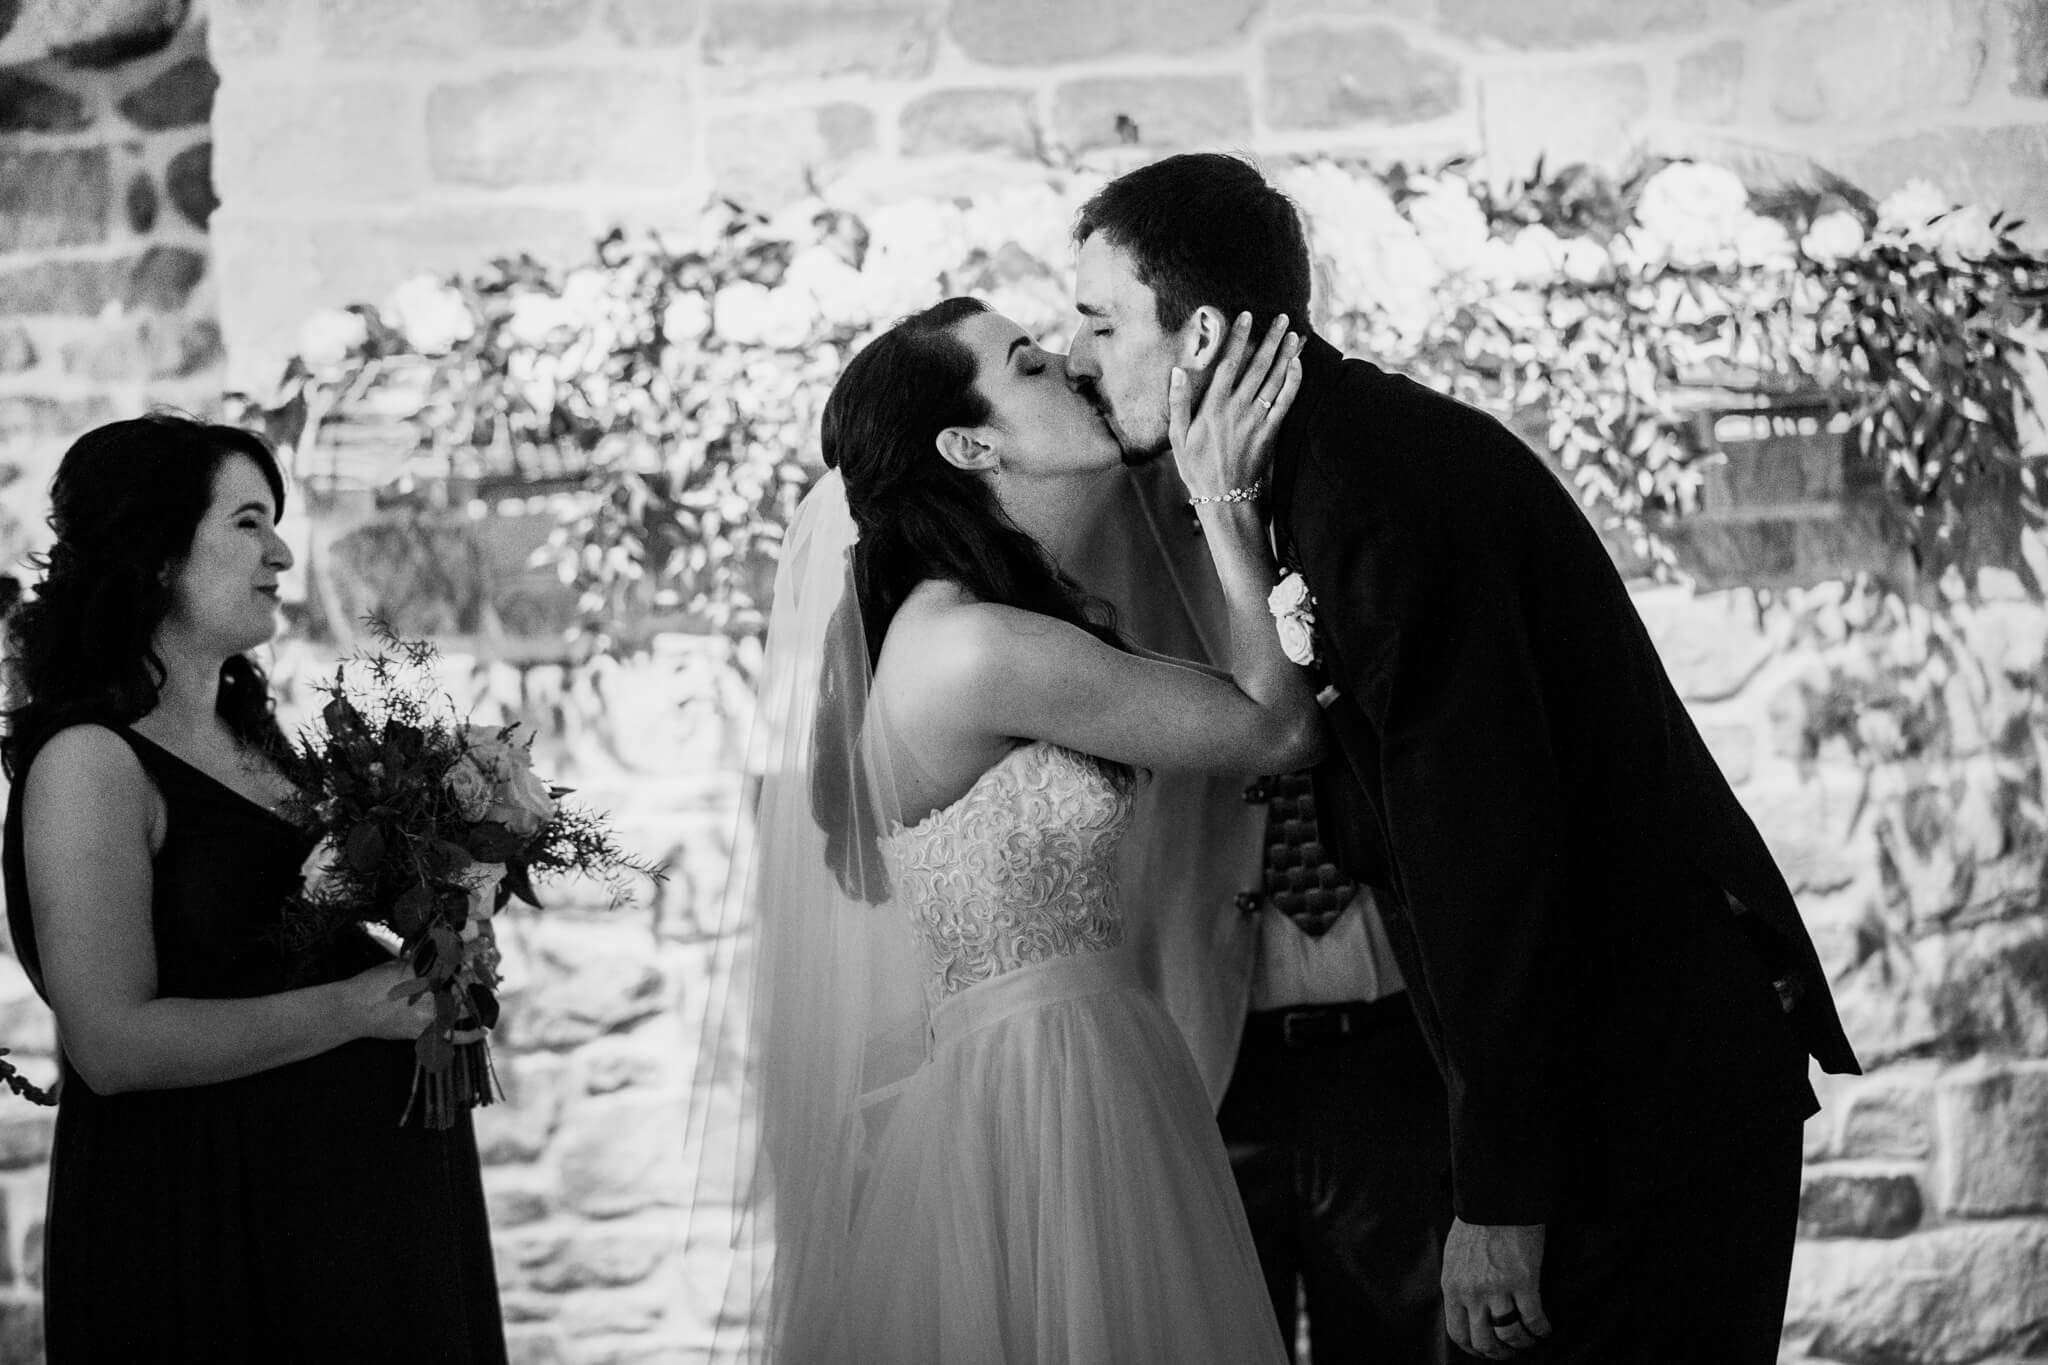 Alysia Jerad Homestead Blessings Farm Hershey PA Wedding Rustic Chique - 101.JPG